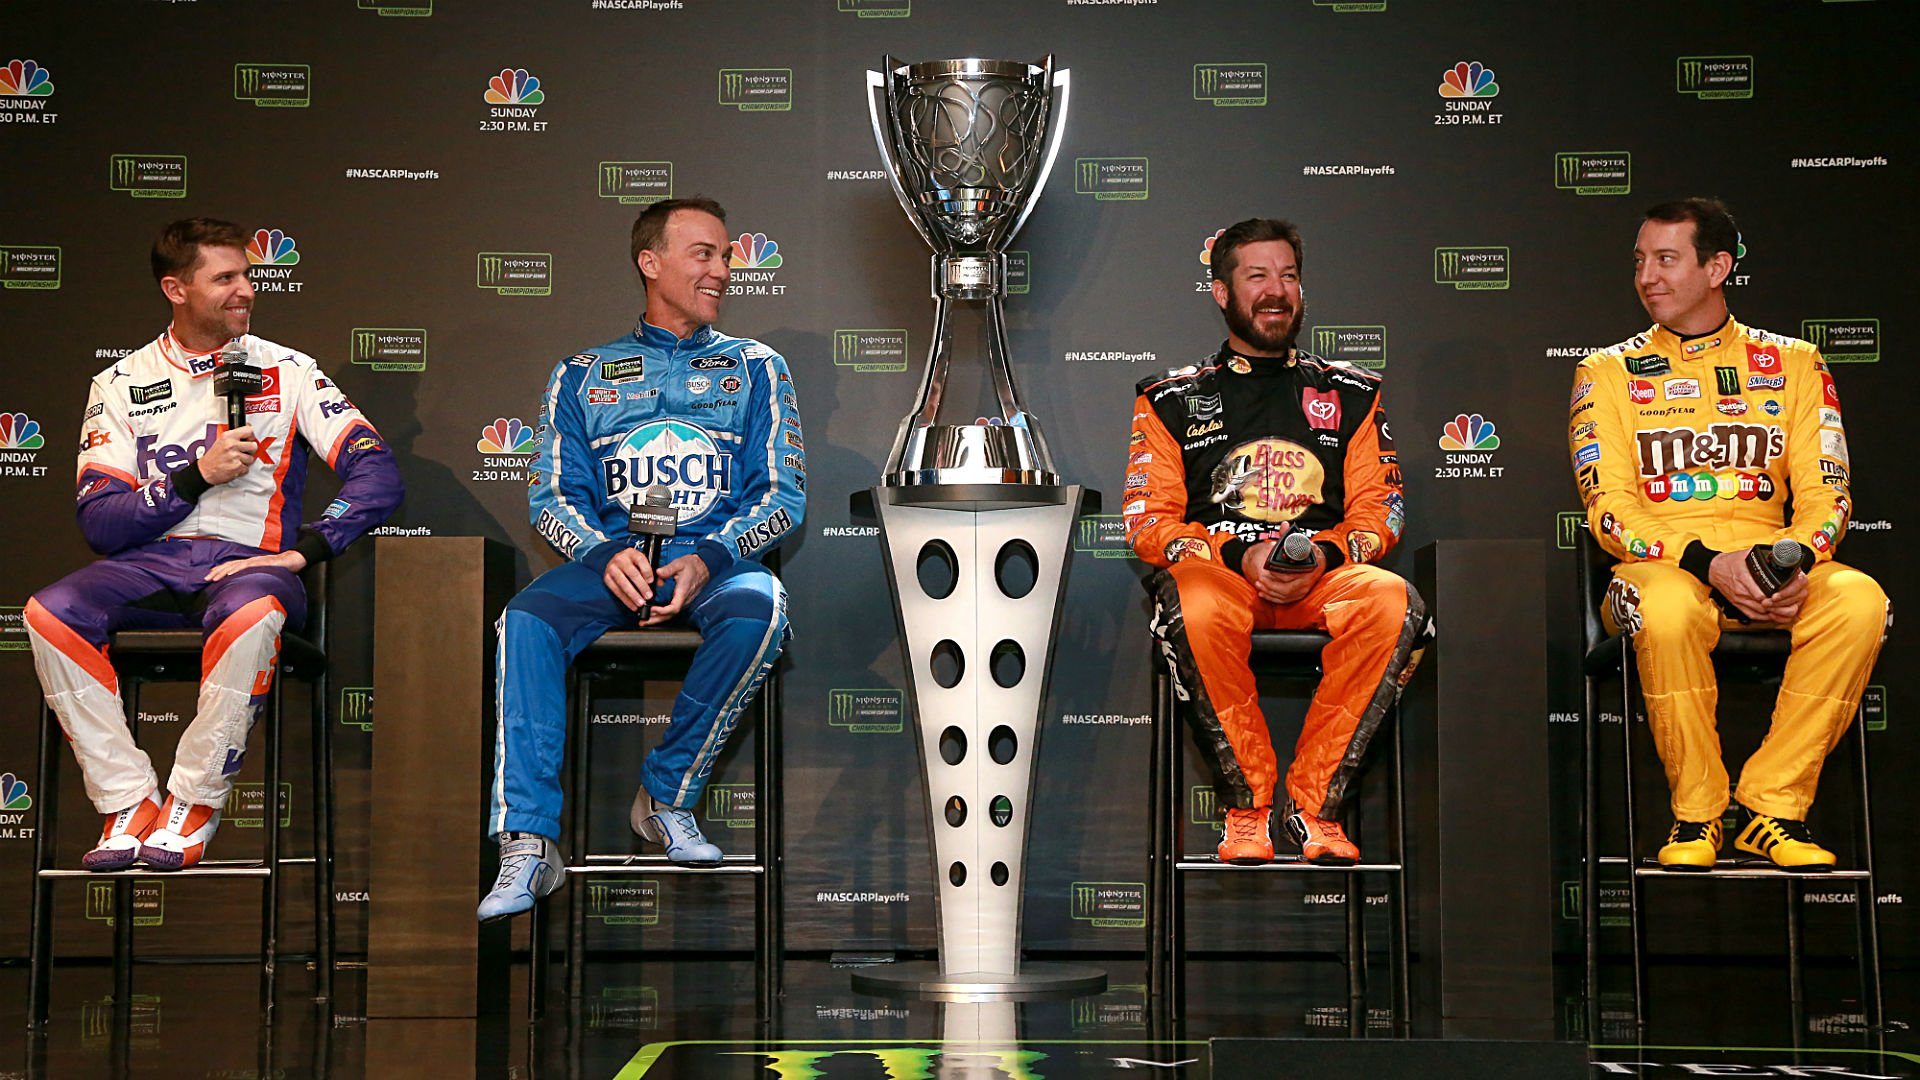 NASCAR Championship 4 Odds